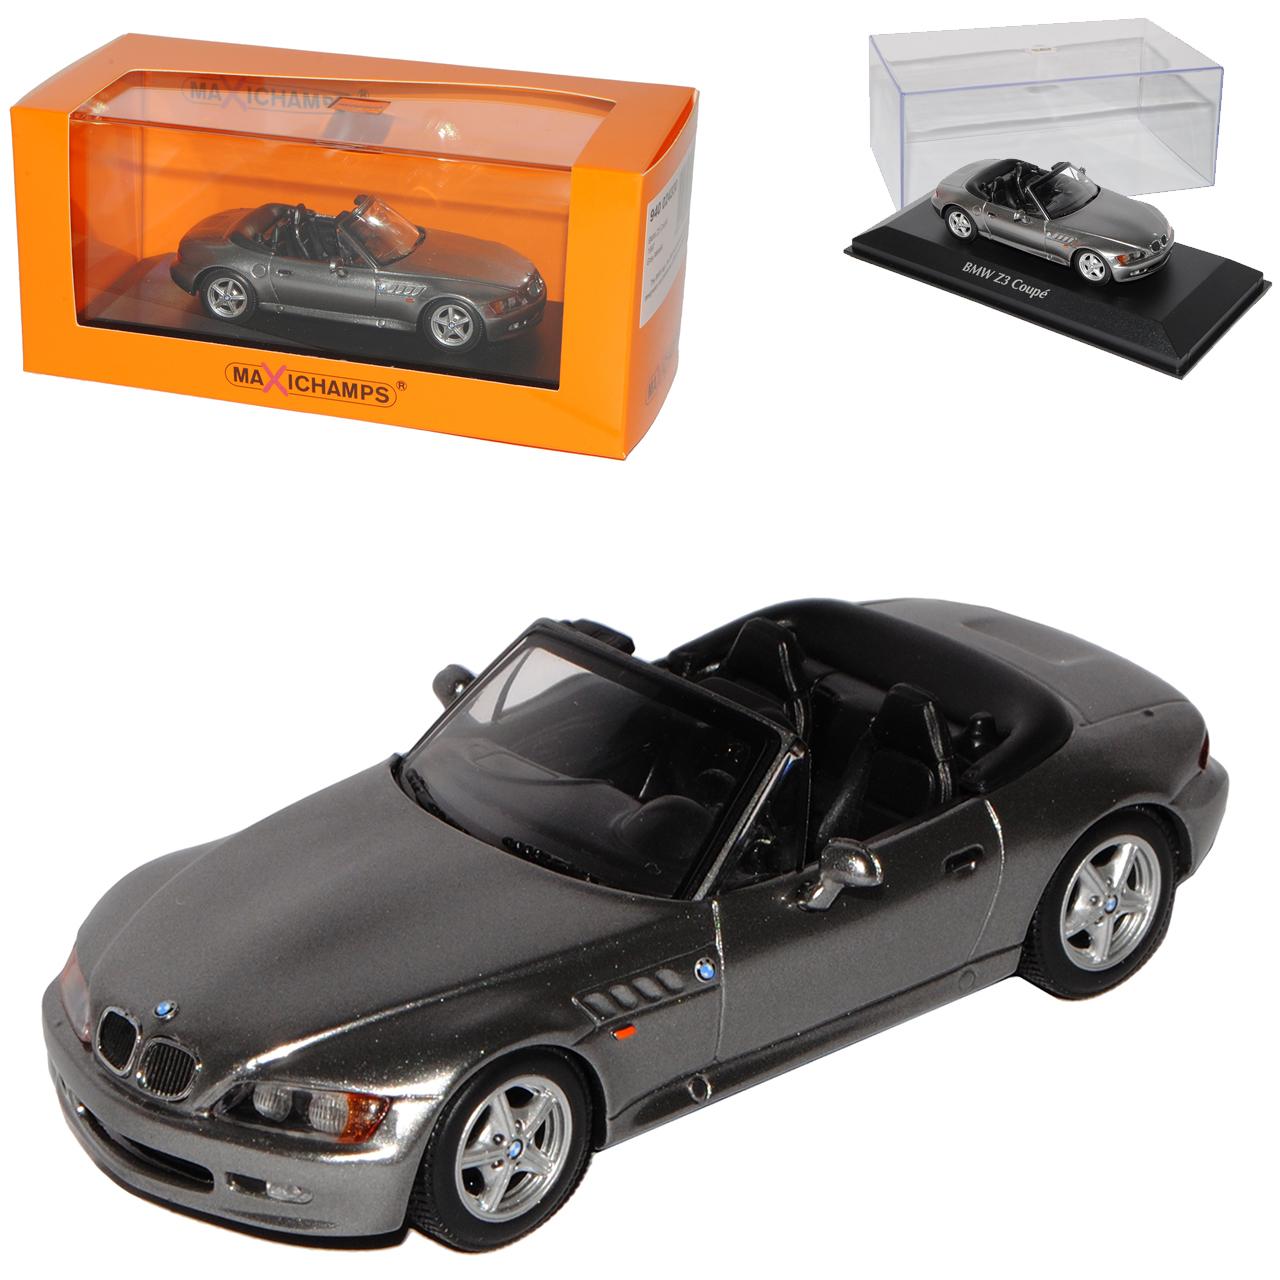 BMW z3 e36 7 ROADSTER CONGrünIBLE grau 1995-2002 1 43 Minichamps Maxi Champs Model...